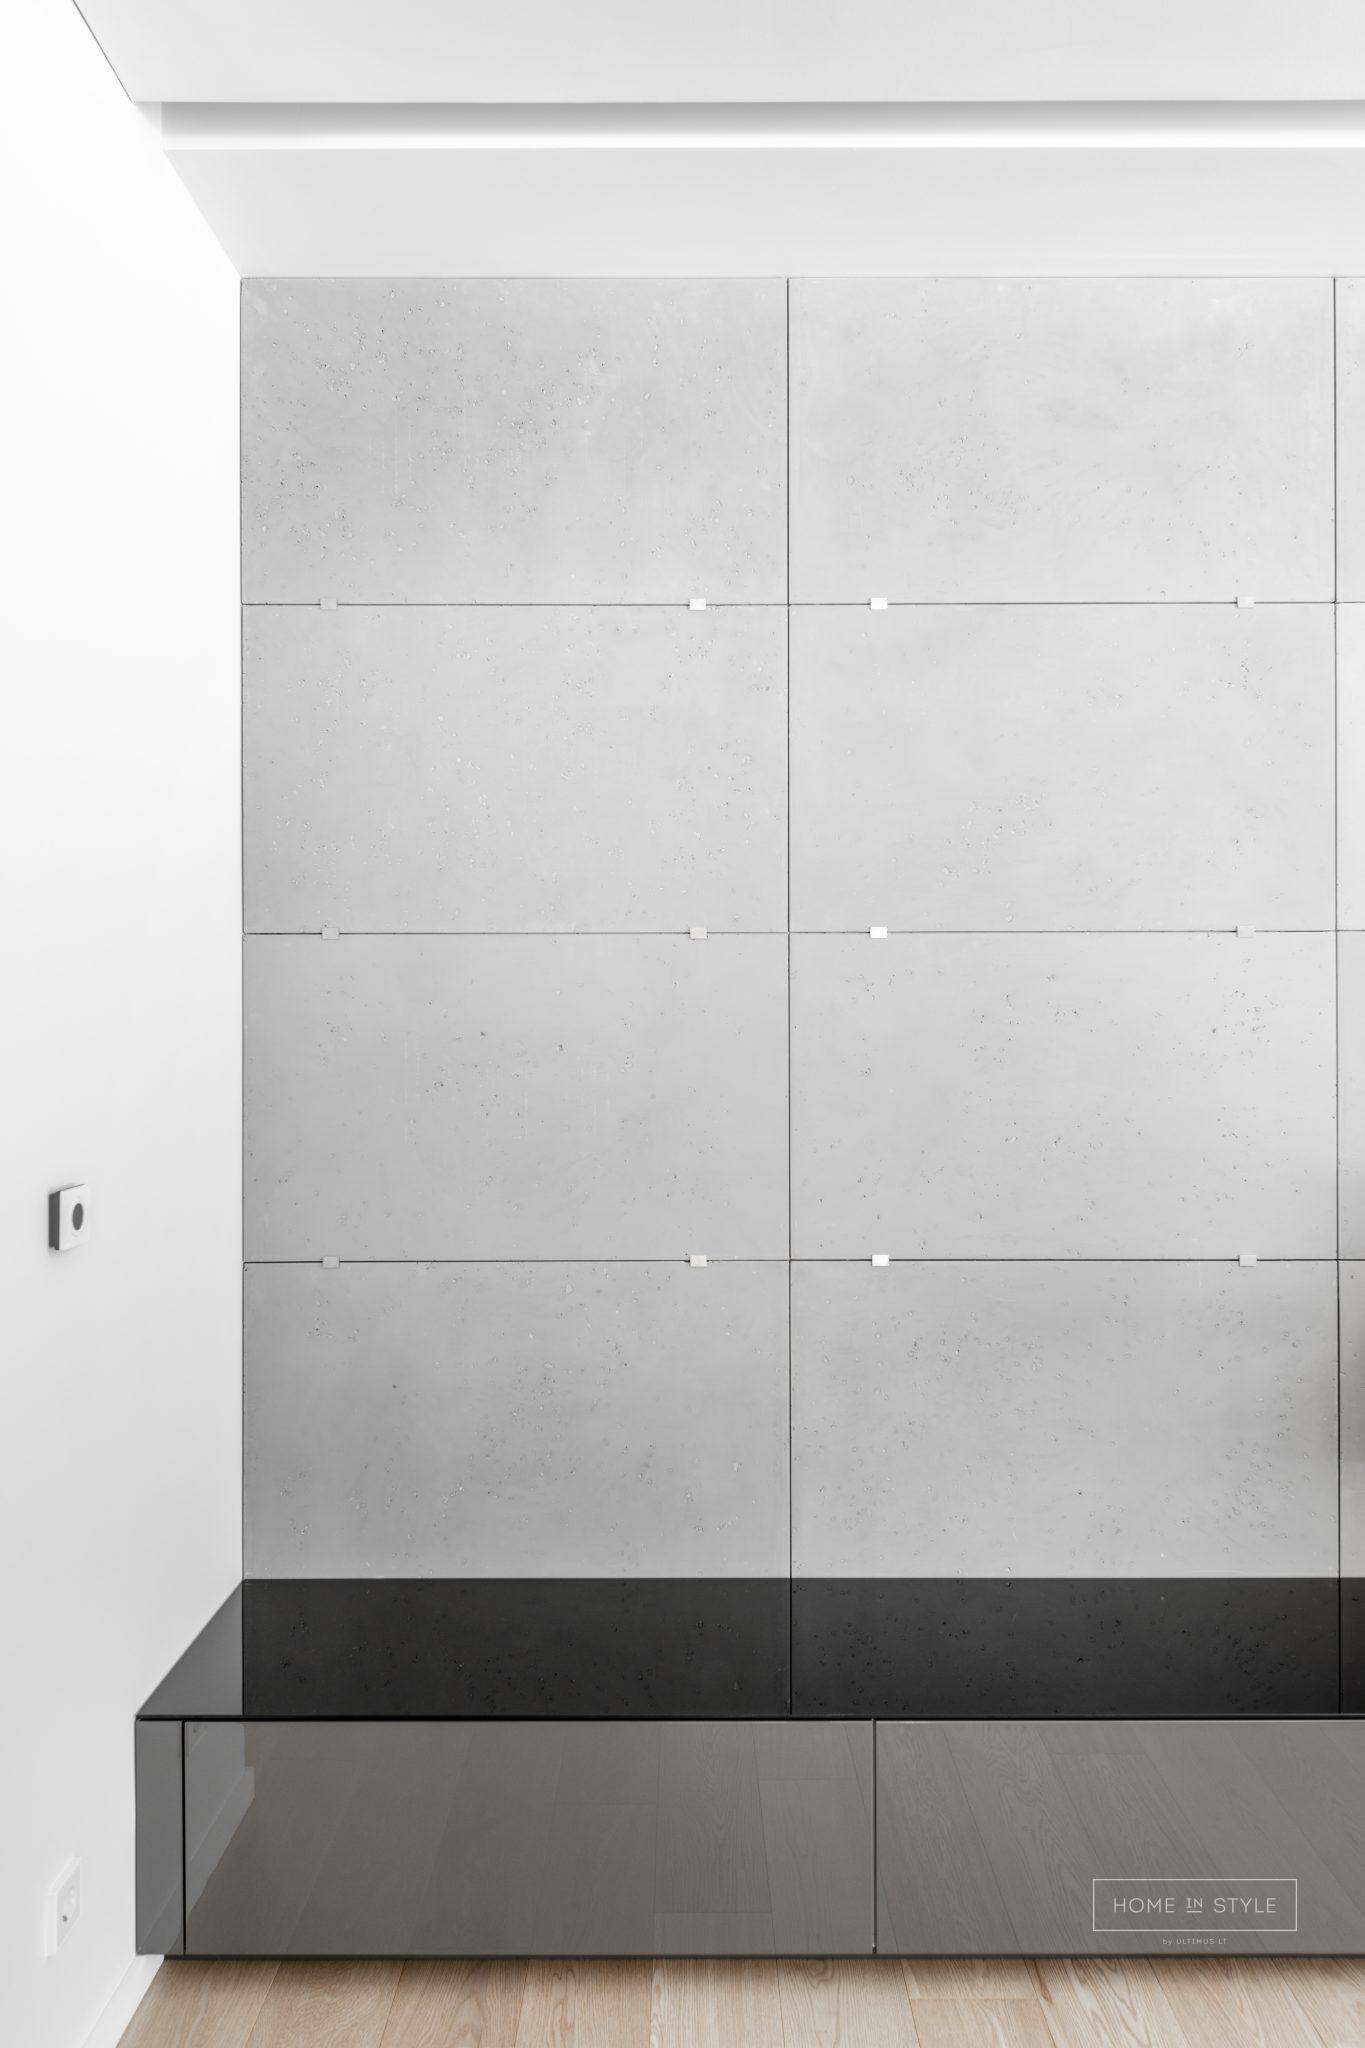 Stilingu svetaines baldu gamyba pagal individualius uzsakymus